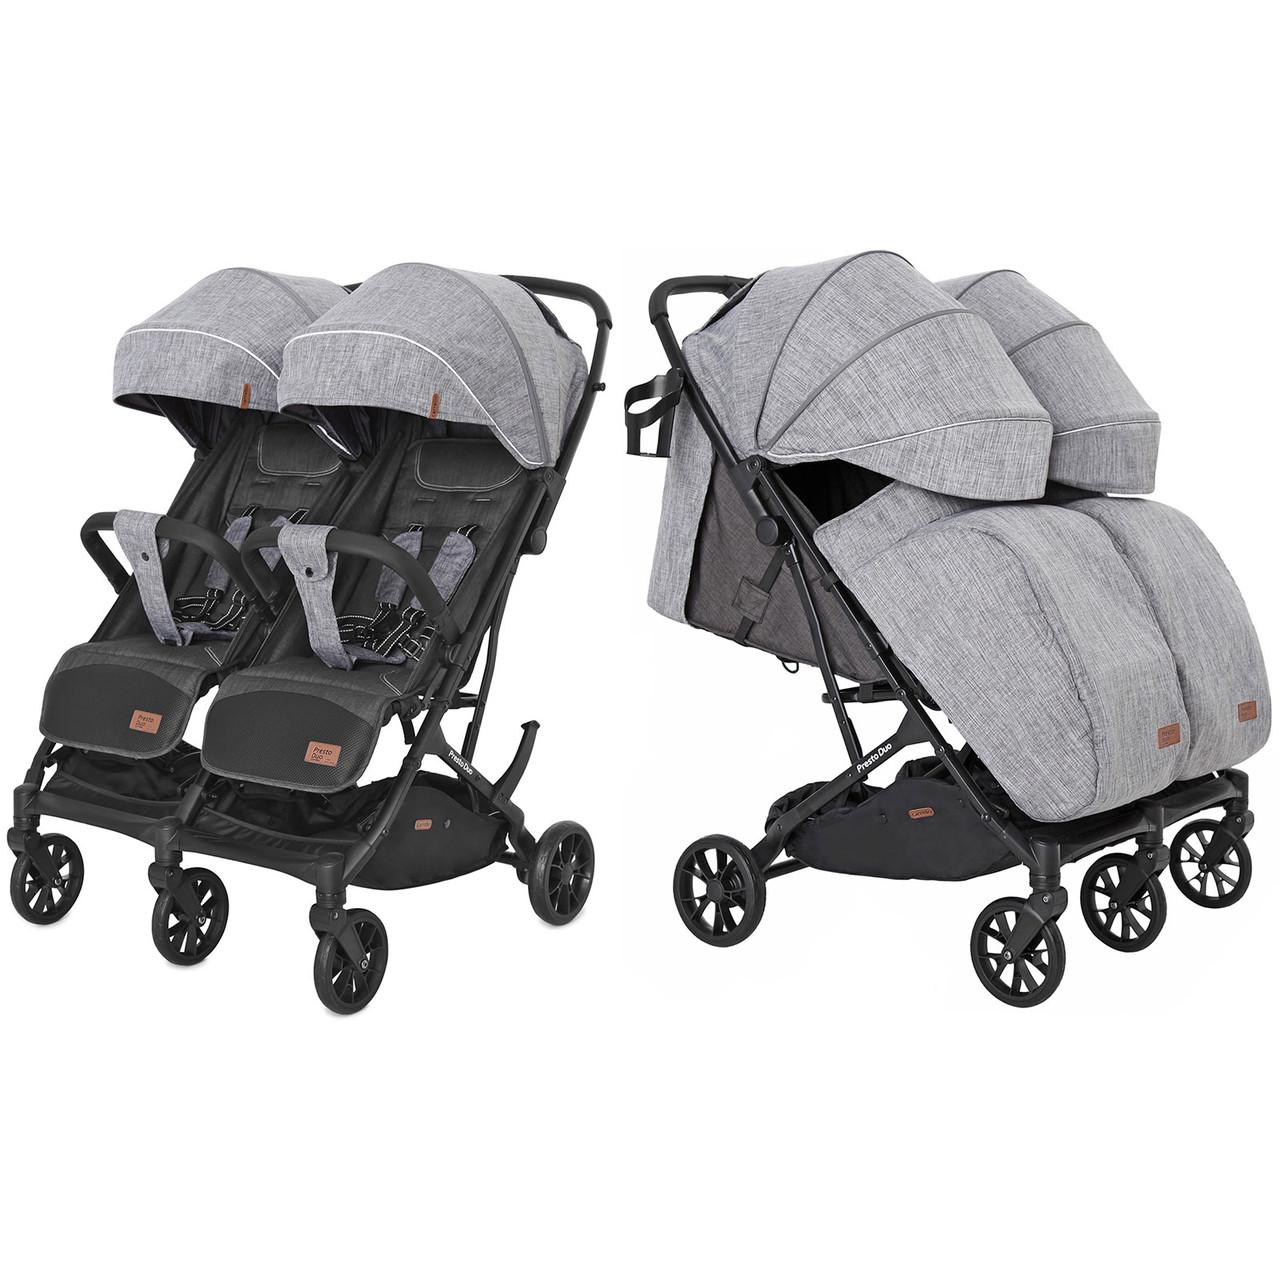 Коляска прогулочная CARRELLO Presto Duo CRL-5506 Pitch Grey +дождевик /1/ MOQ